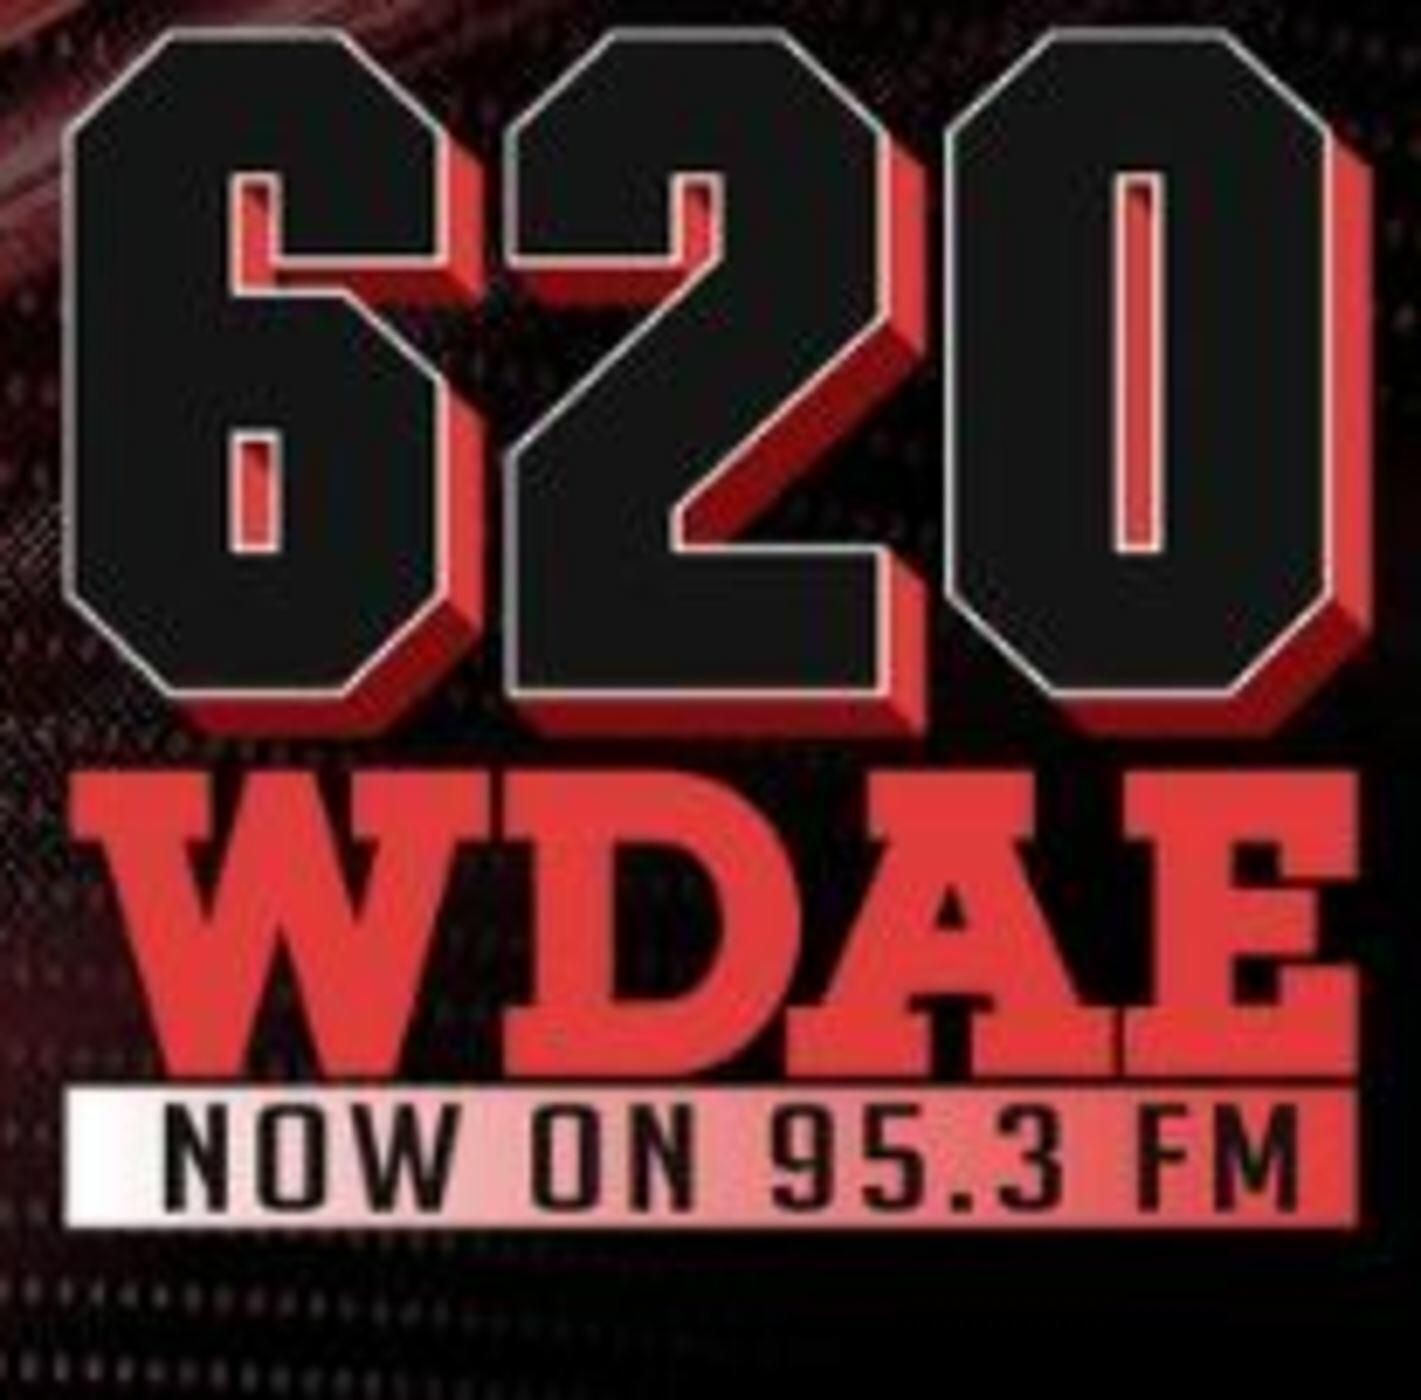 Listen to Bolts Breakdown - Chicago Blackhawks vs Tampa Bay Lightning | WDAE On Demand | Podcasts